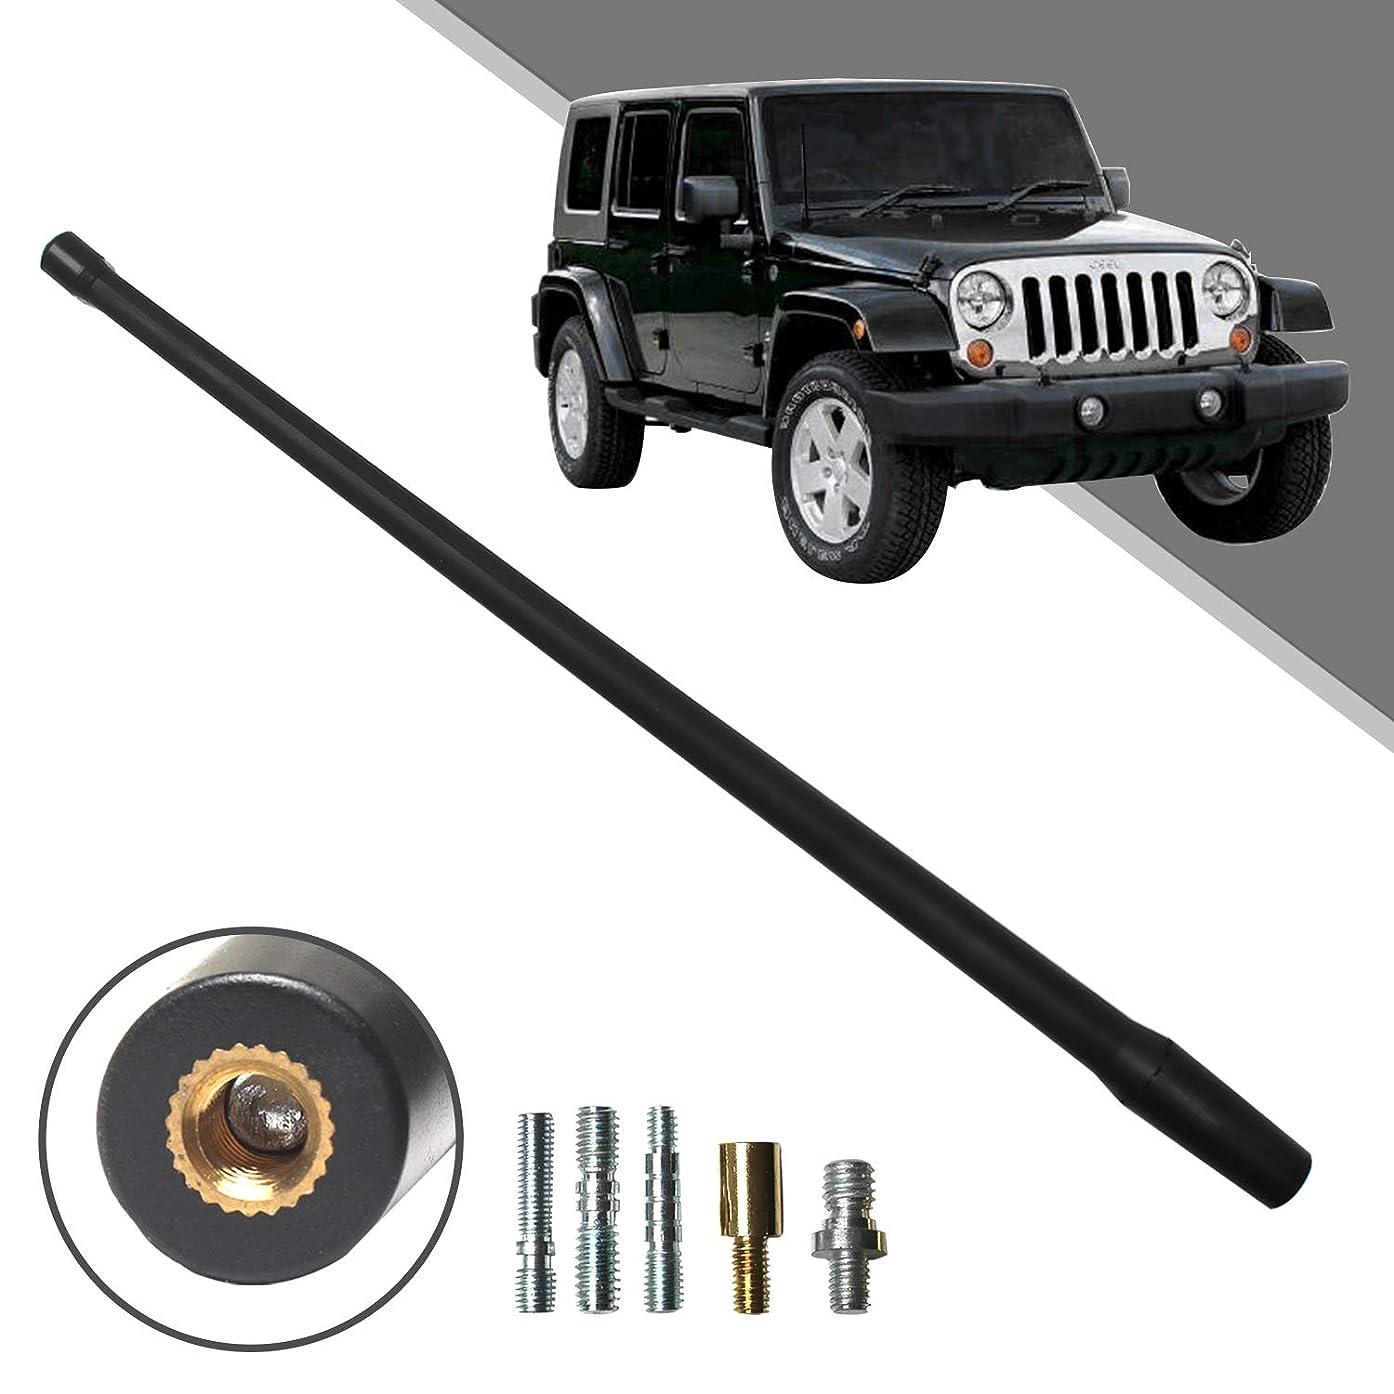 Beneges 13 Inch Flexible Rubber Replacement Antenna Compatible with 2007-2019 Jeep Wrangler JK JKU JL JLU Rubicon Sahara, Optimized FM/AM Reception.